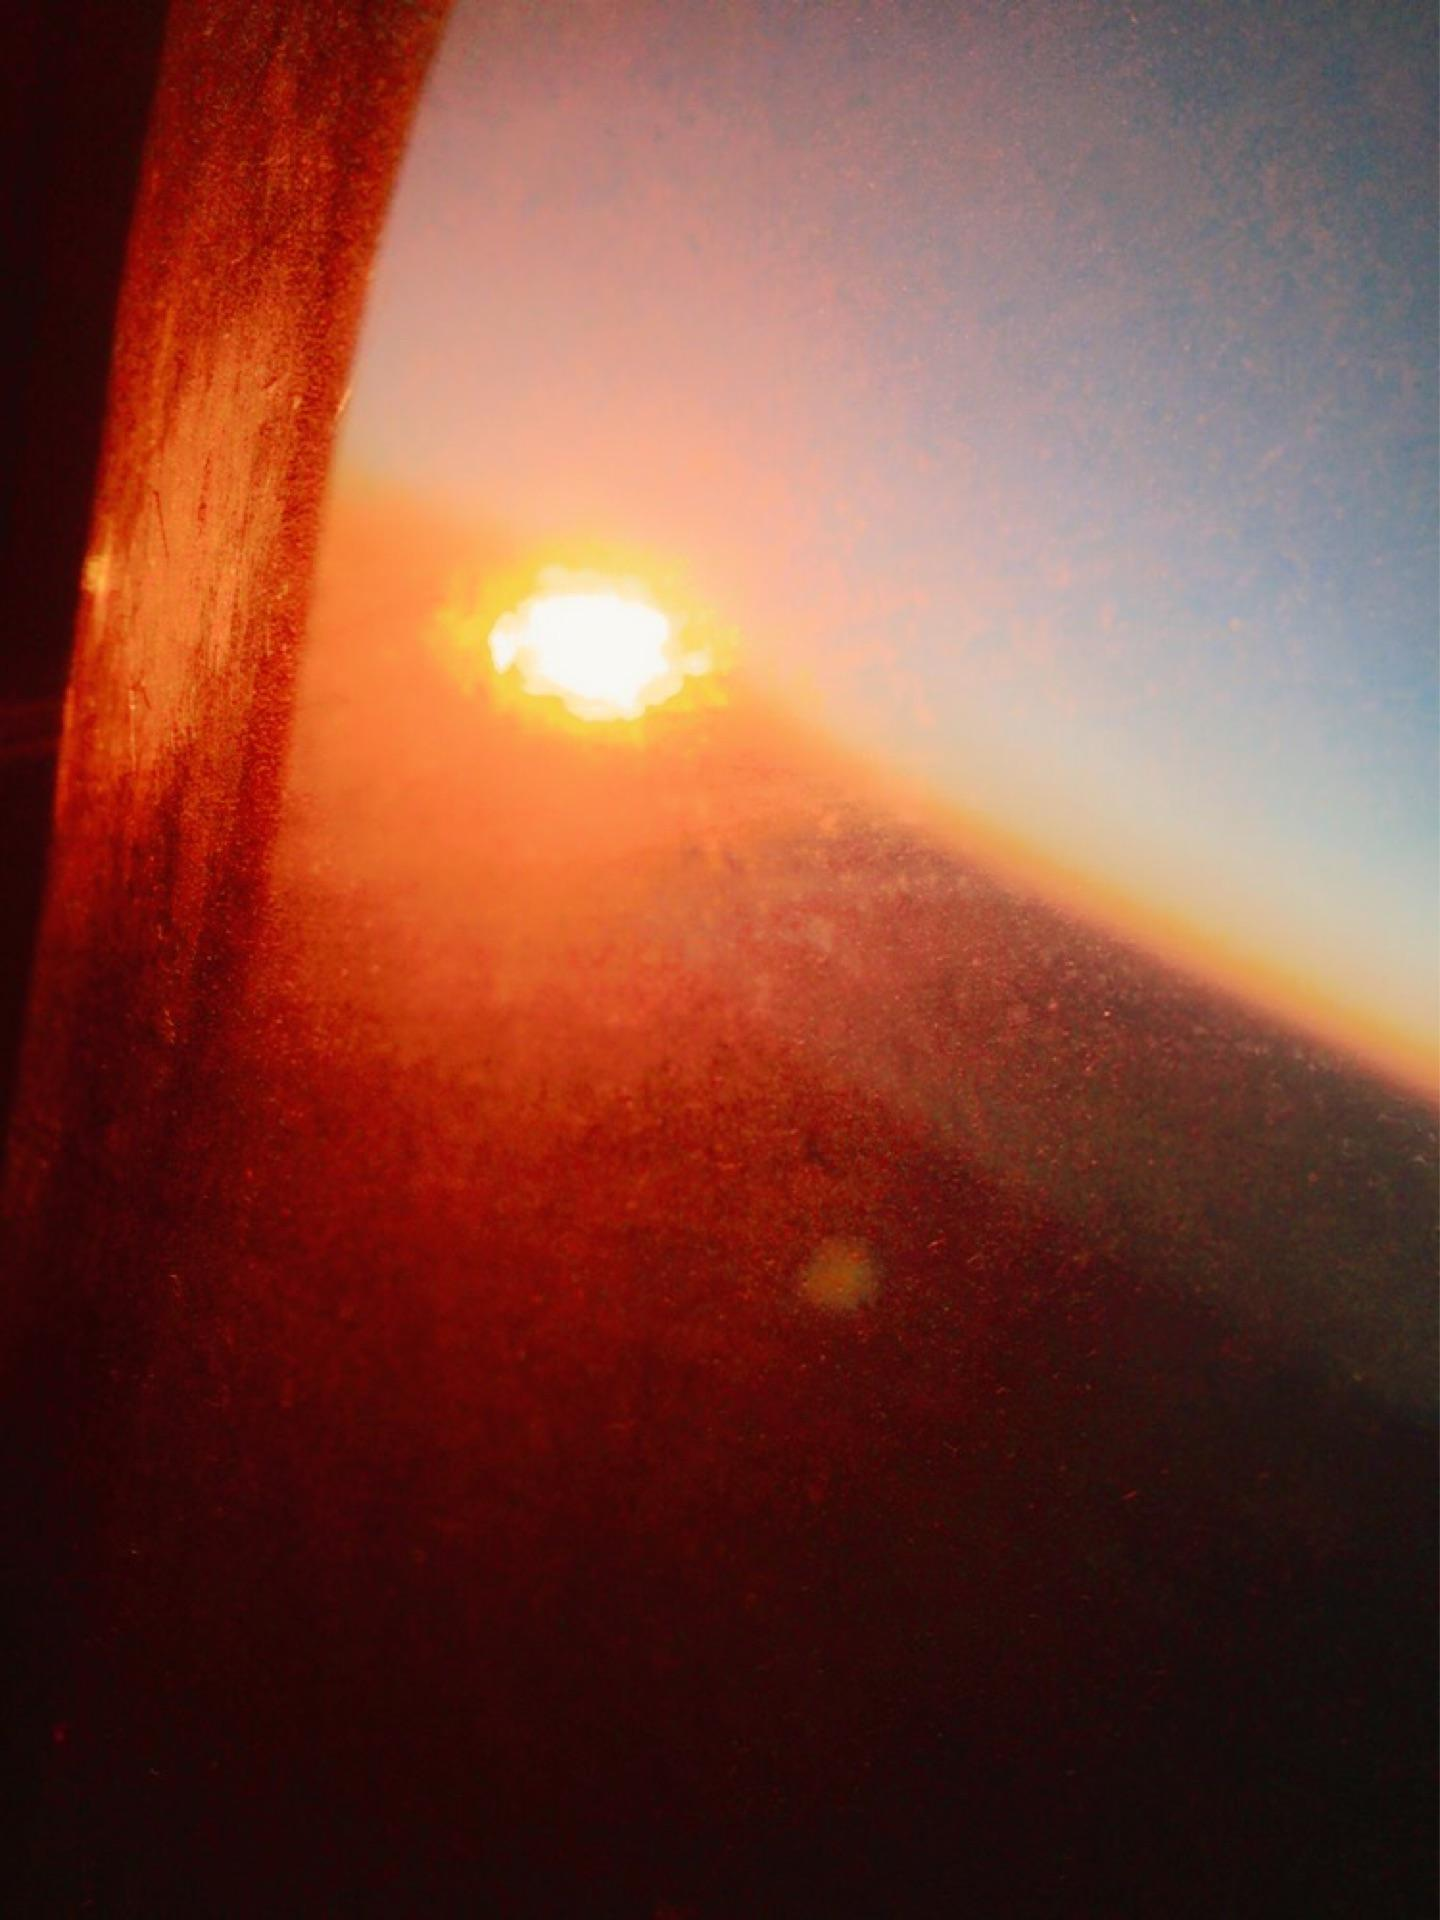 【NMB48】太田夢莉応援スレ★66【ゆーり】©2ch.netYouTube動画>72本 ->画像>993枚